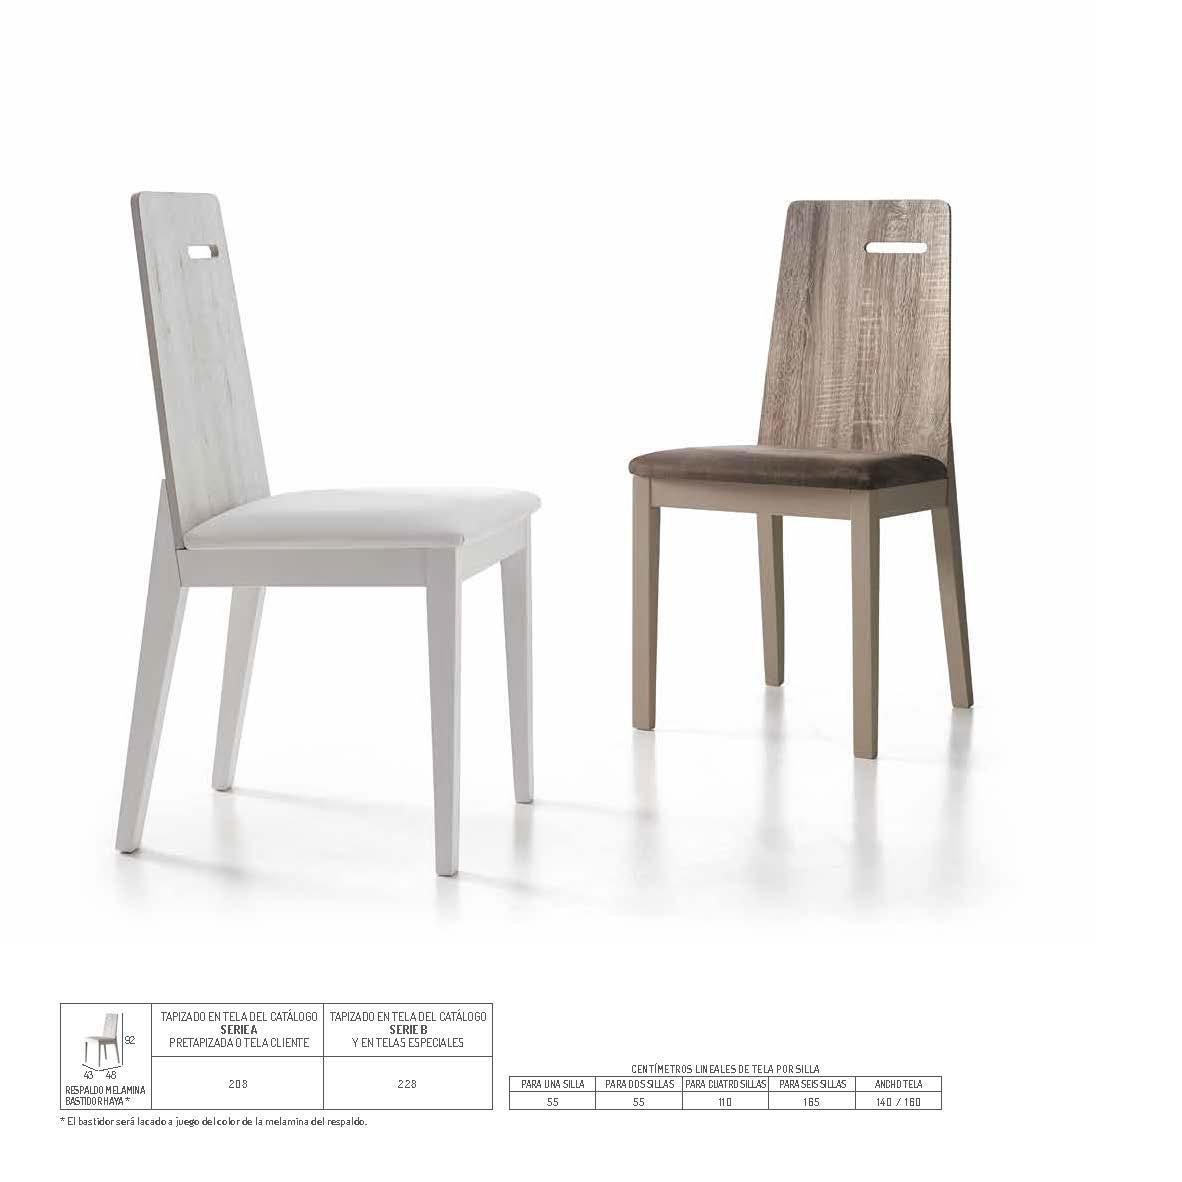 Ficha técnica de sillas 14f-00022